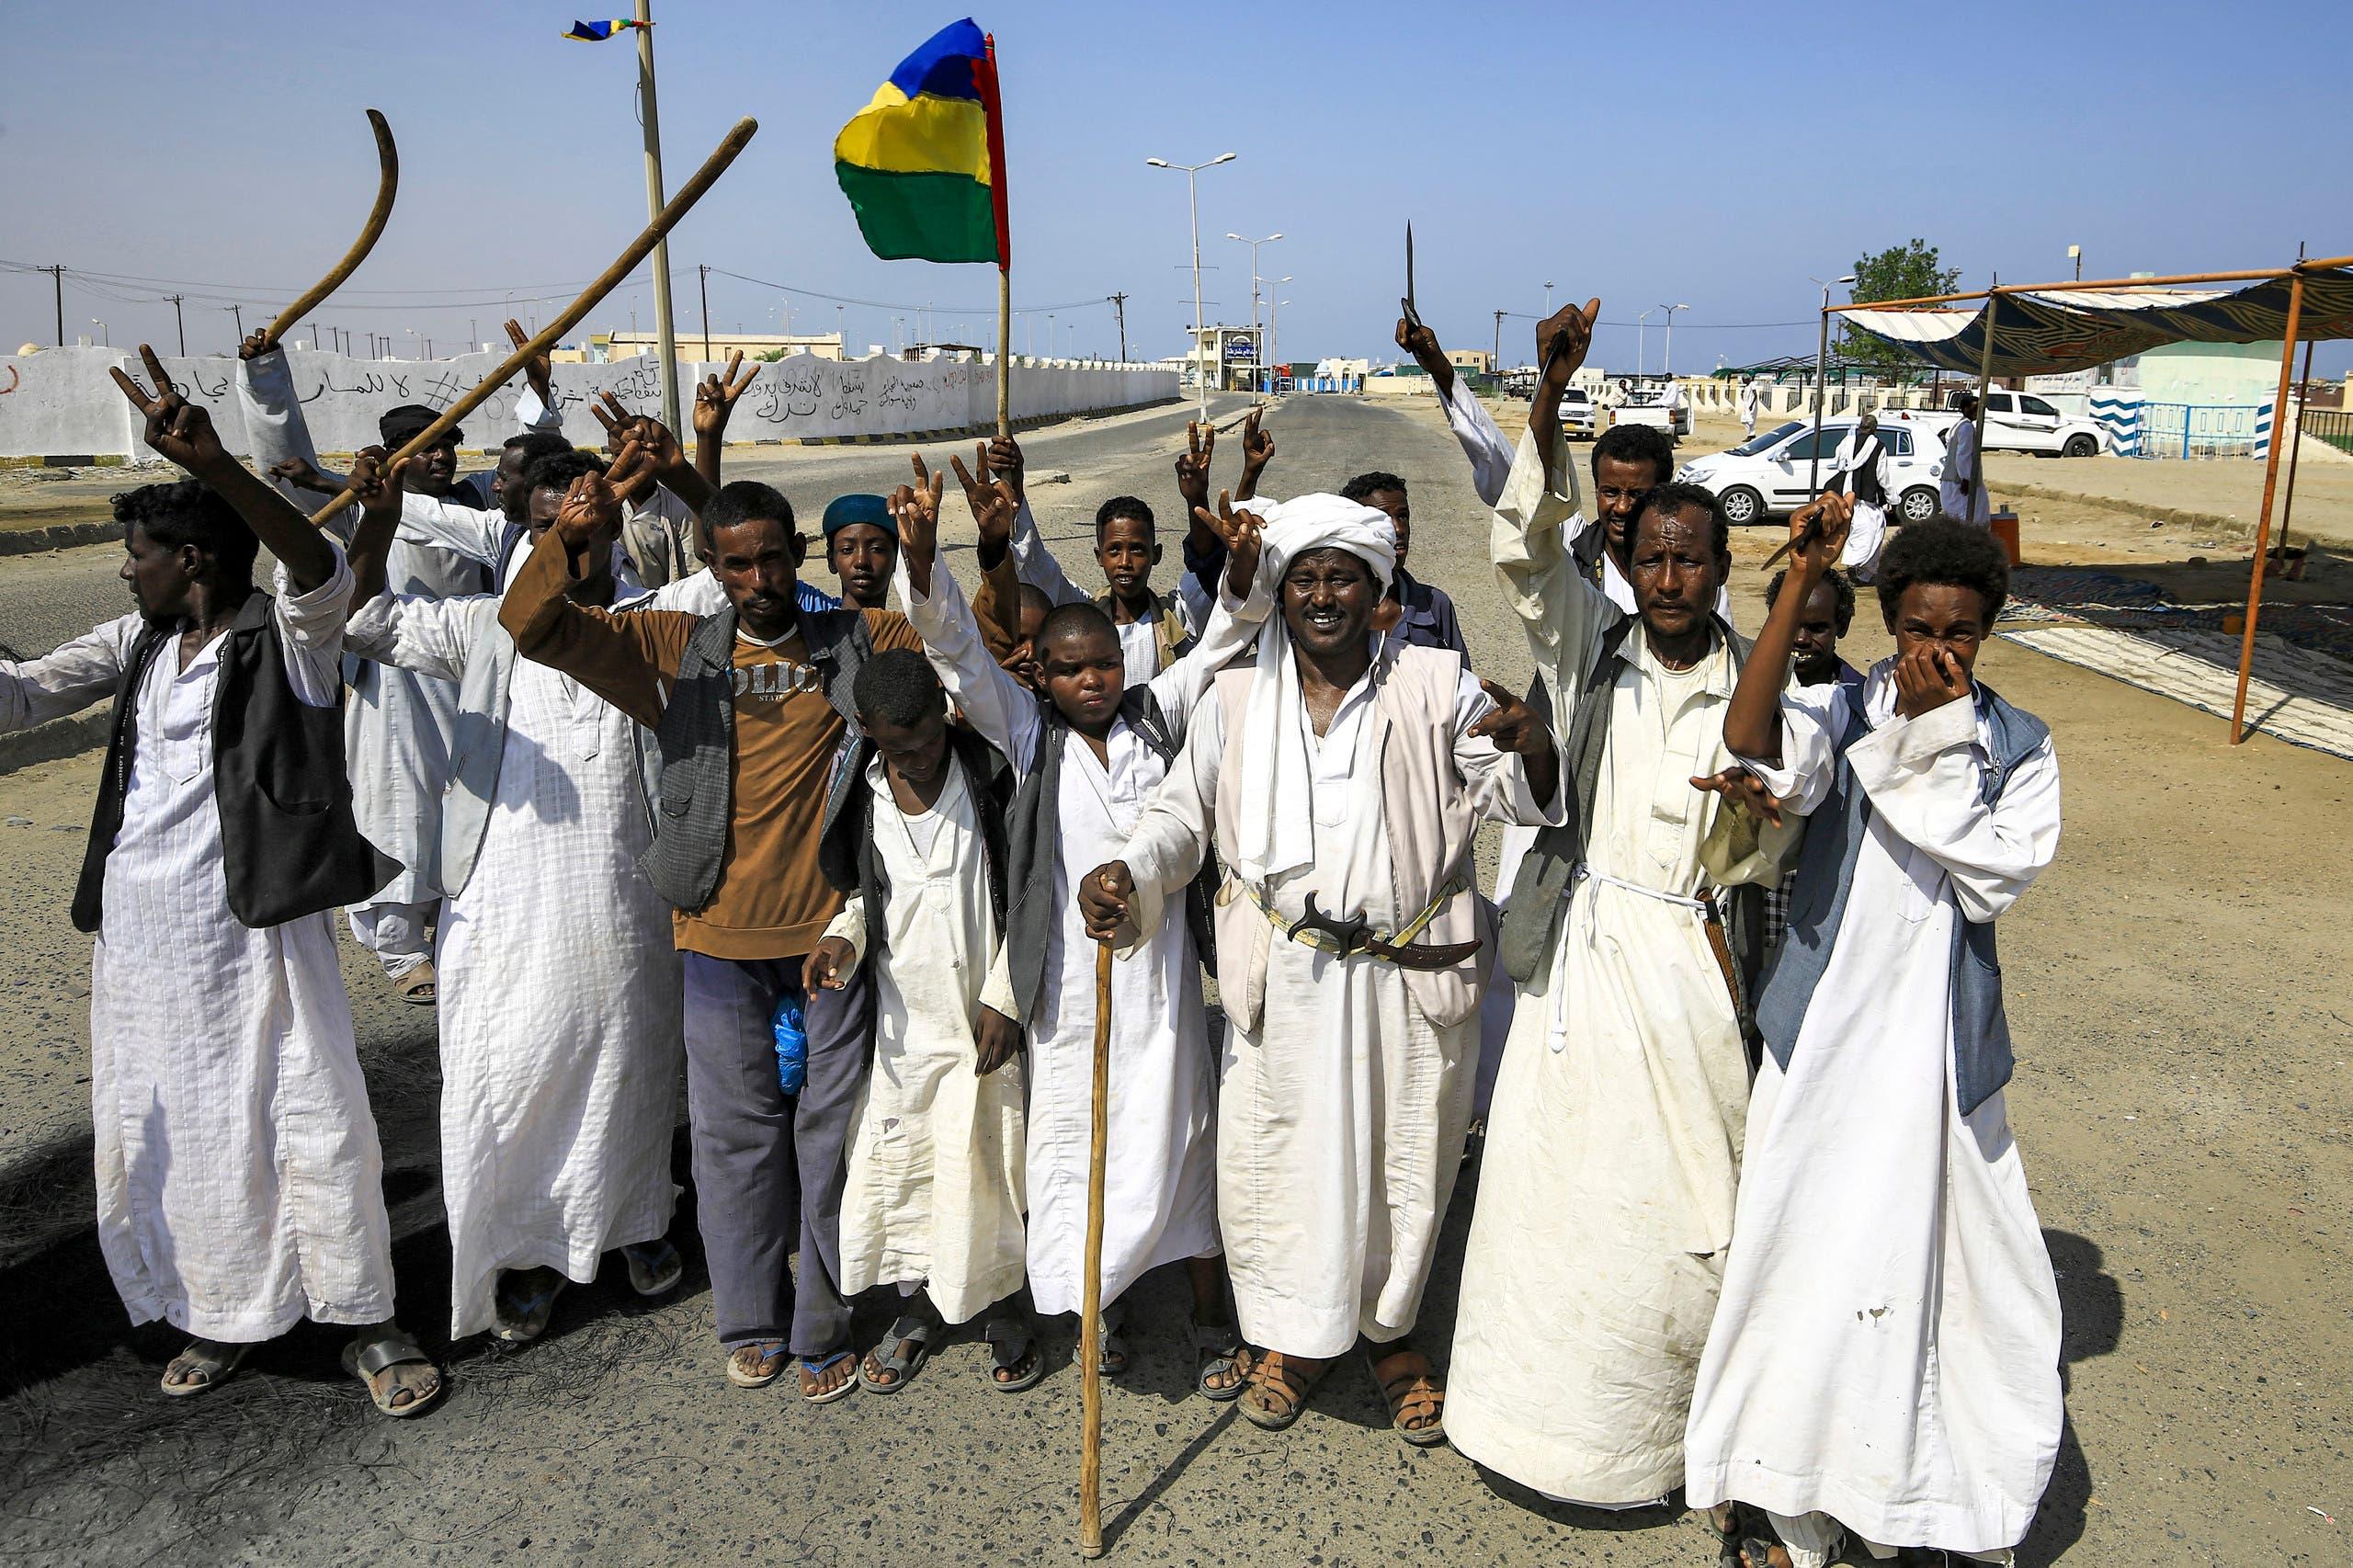 Beja glasses: beware of the return of the armed movement in eastern Sudan